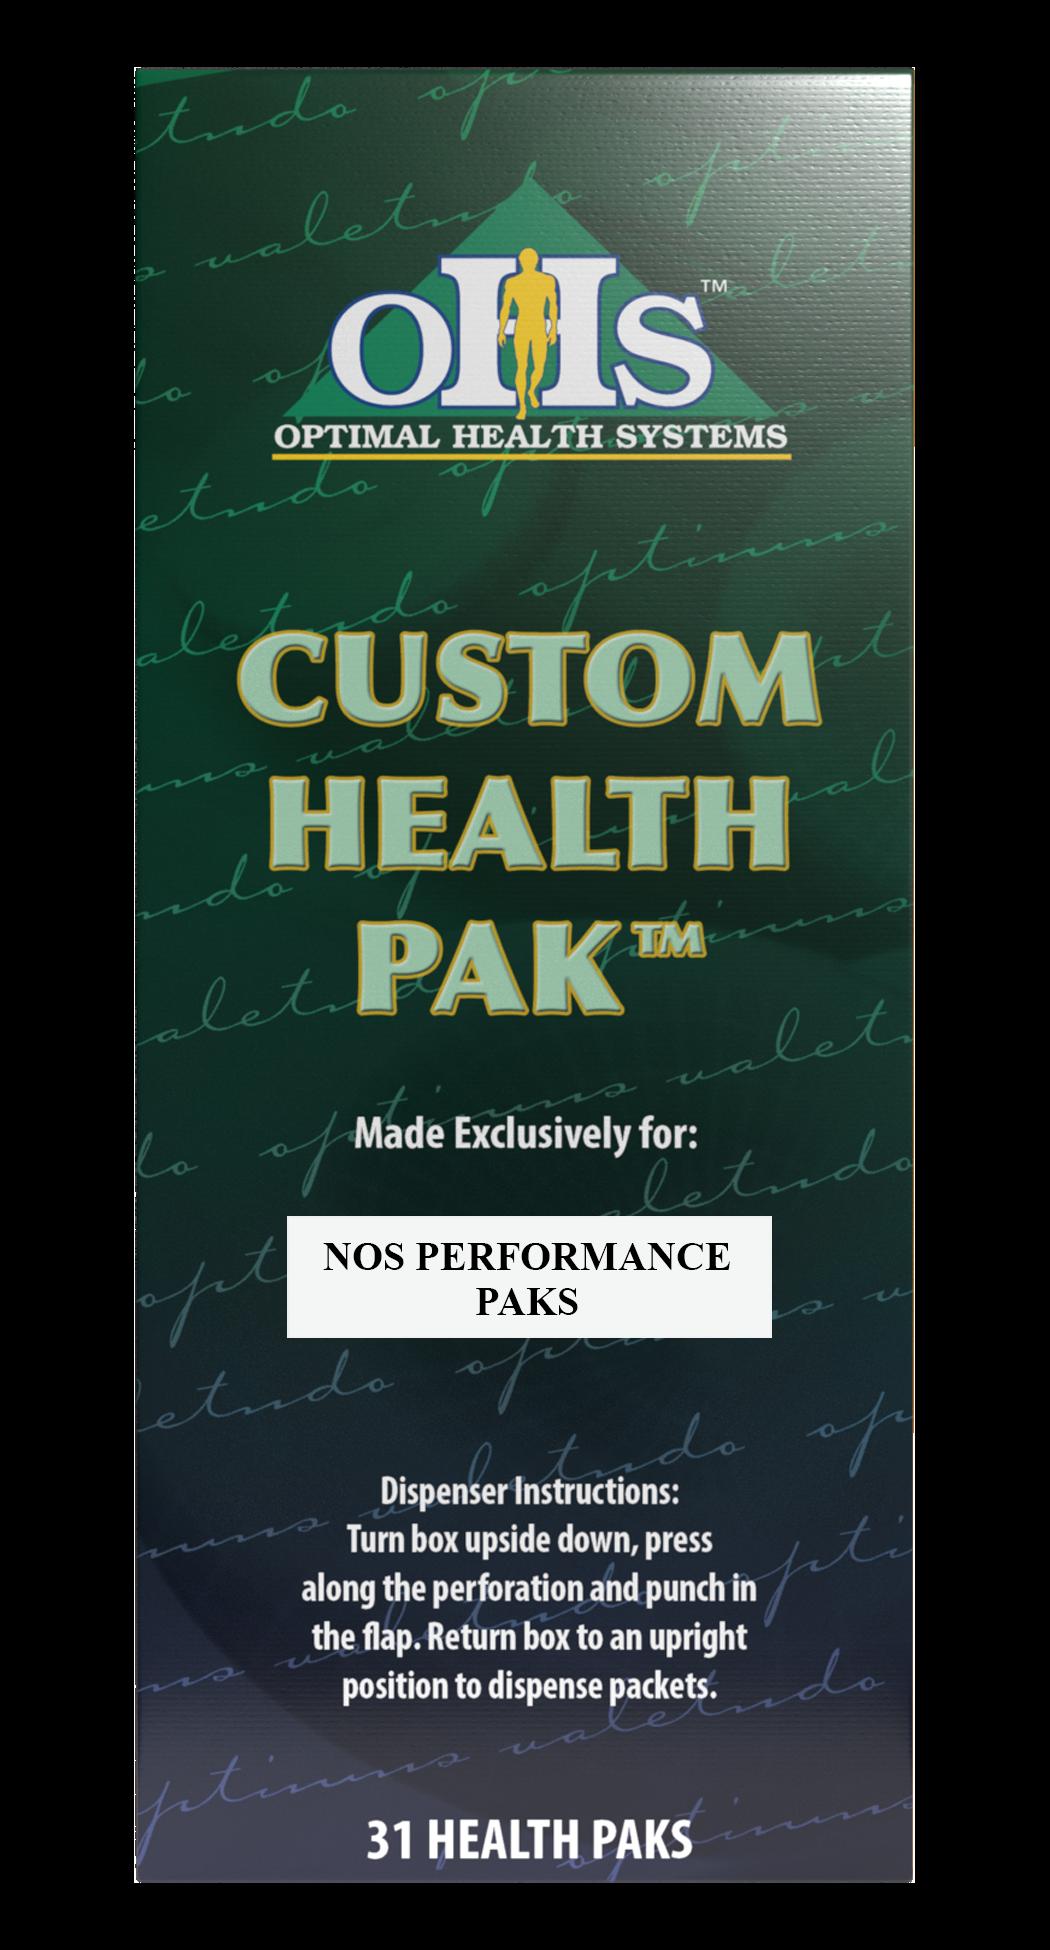 NOS Performance Paks